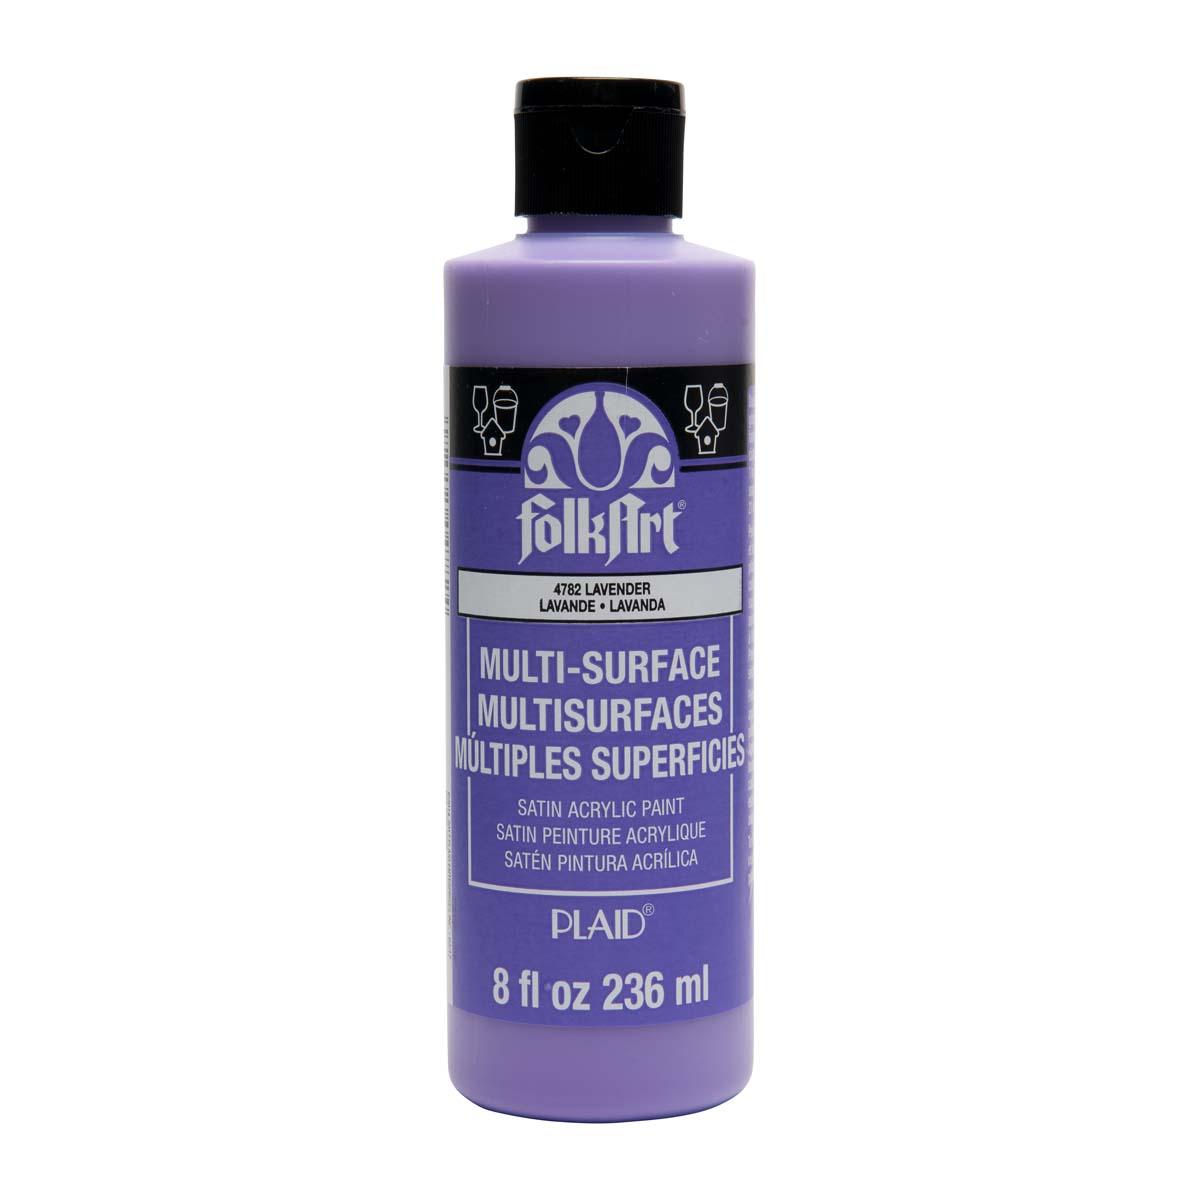 FolkArt ® Multi-Surface Satin Acrylic Paints - Lavender, 8 oz.